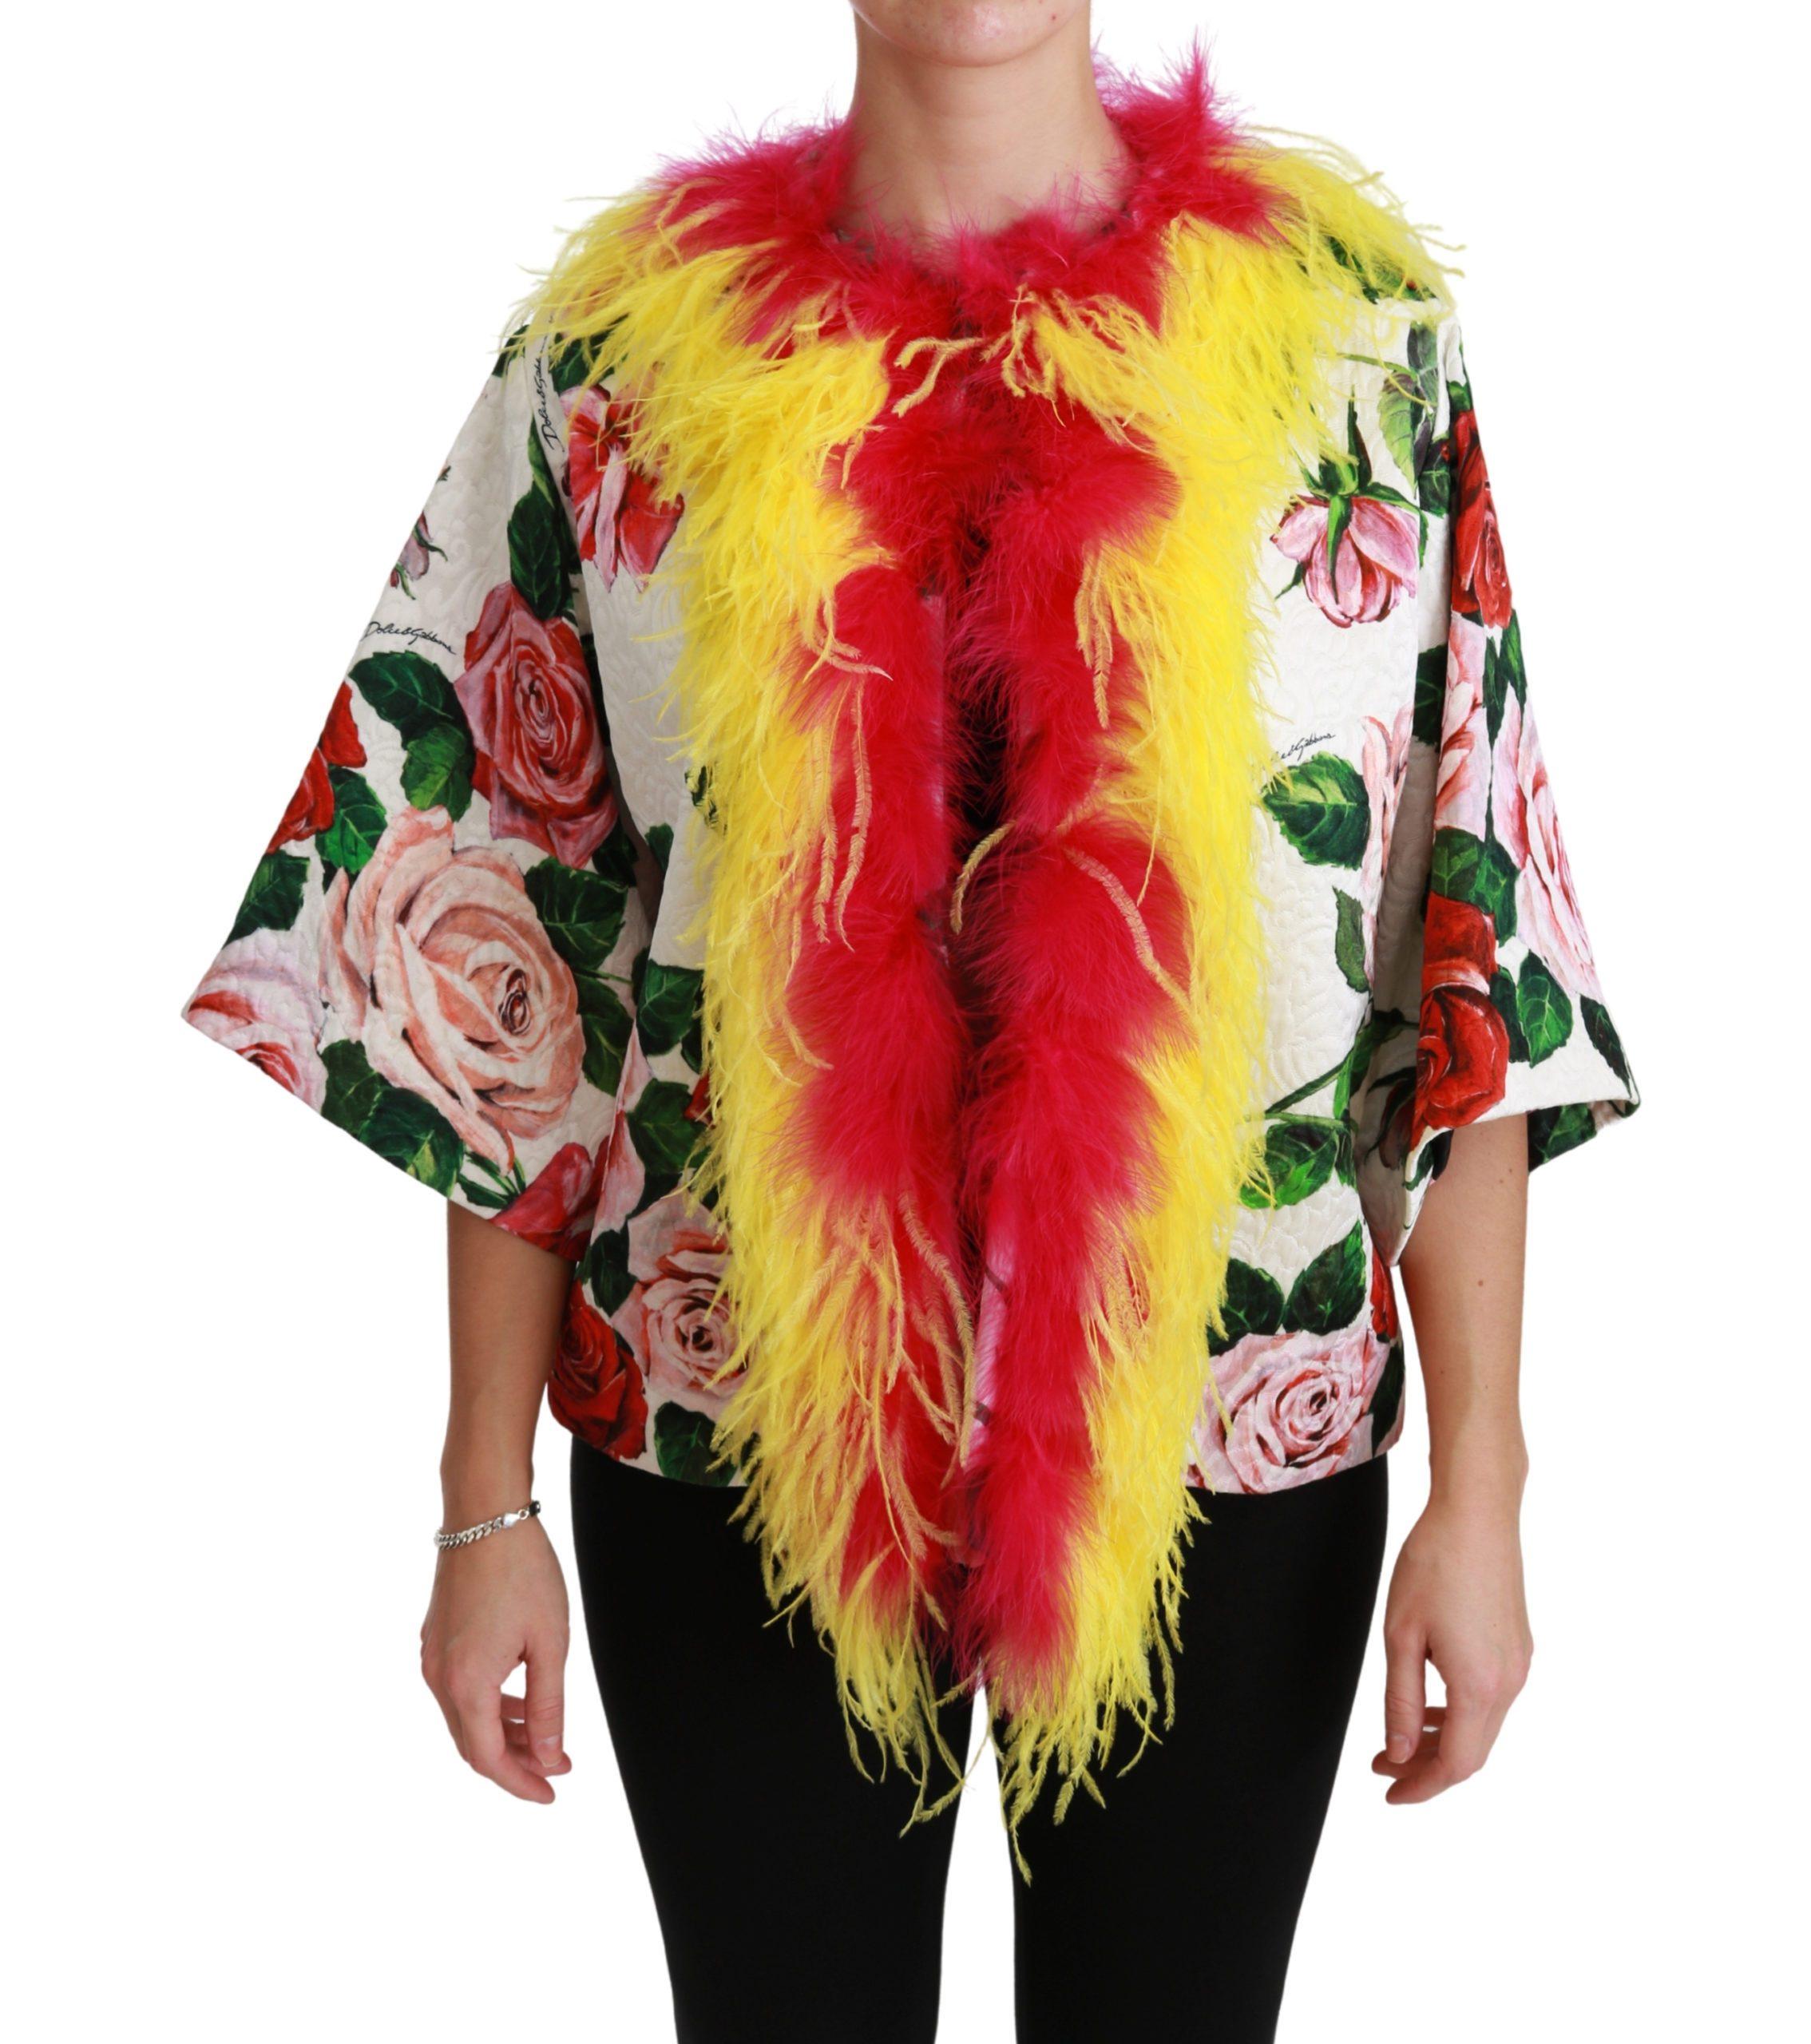 Dolce & Gabbana Women's Floral Coat Capte Fur Roses Jacket White JKT2573 - IT40 S